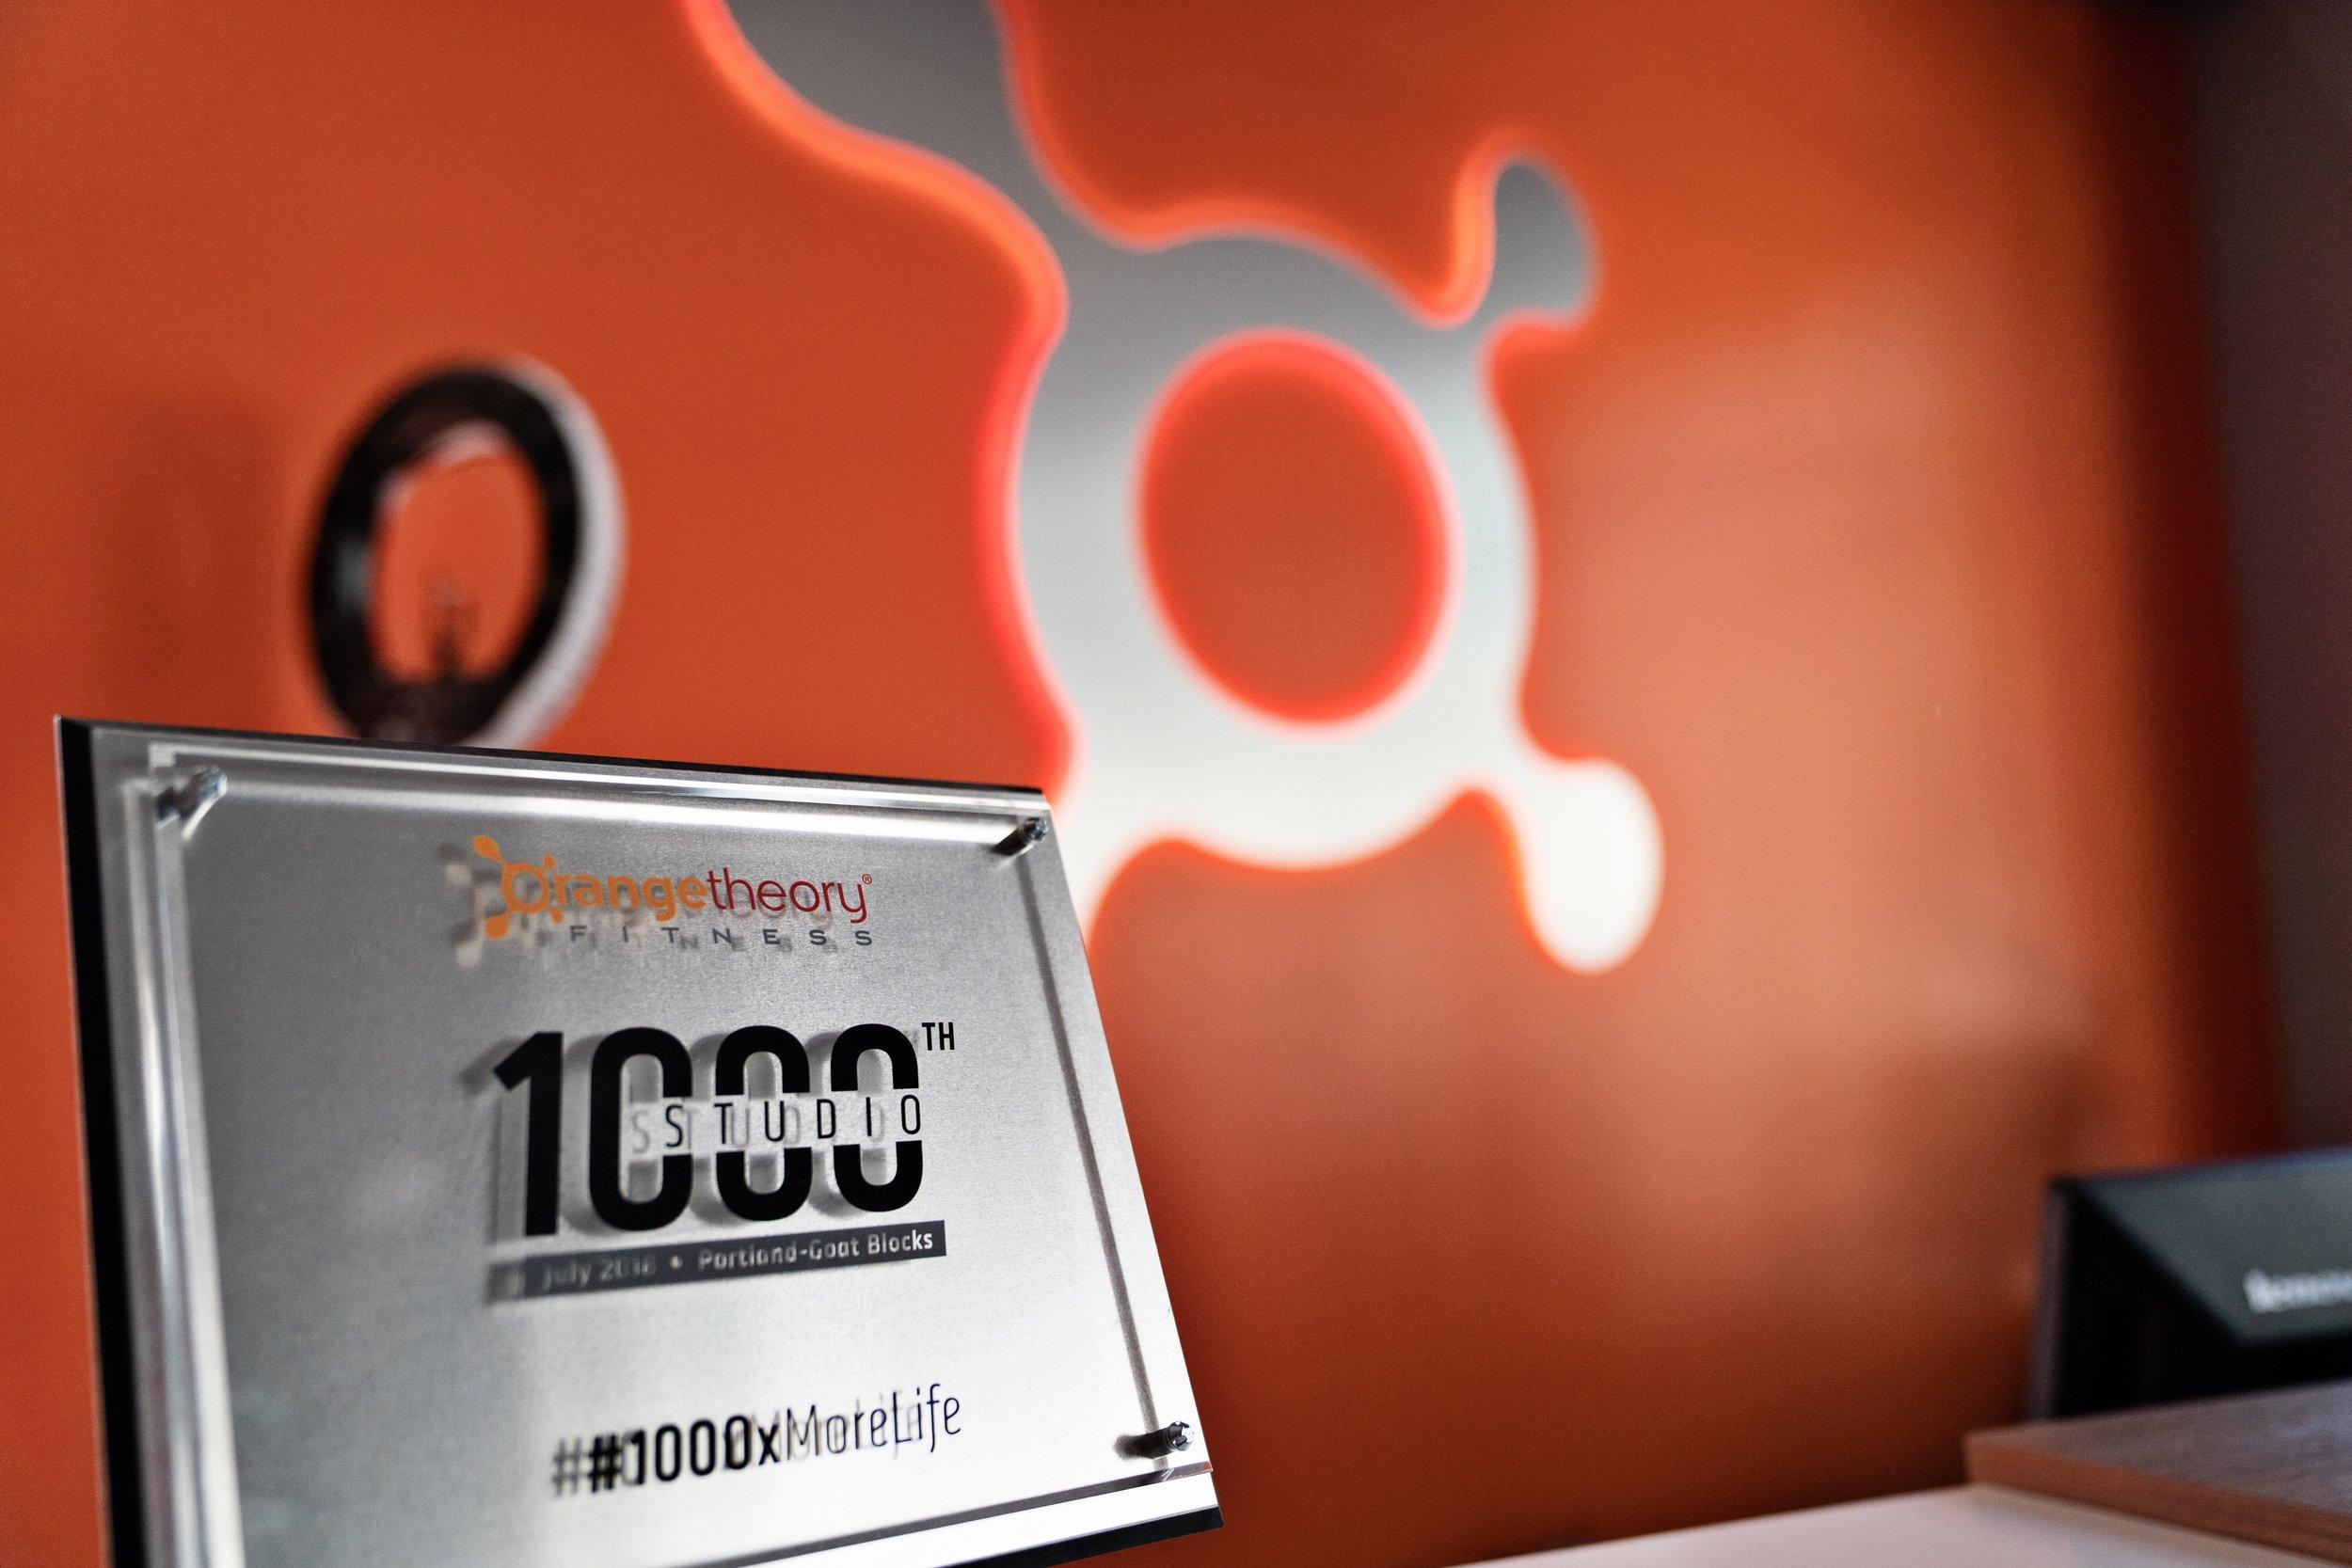 Orangetheory Goat Blocks, the 1000th studio